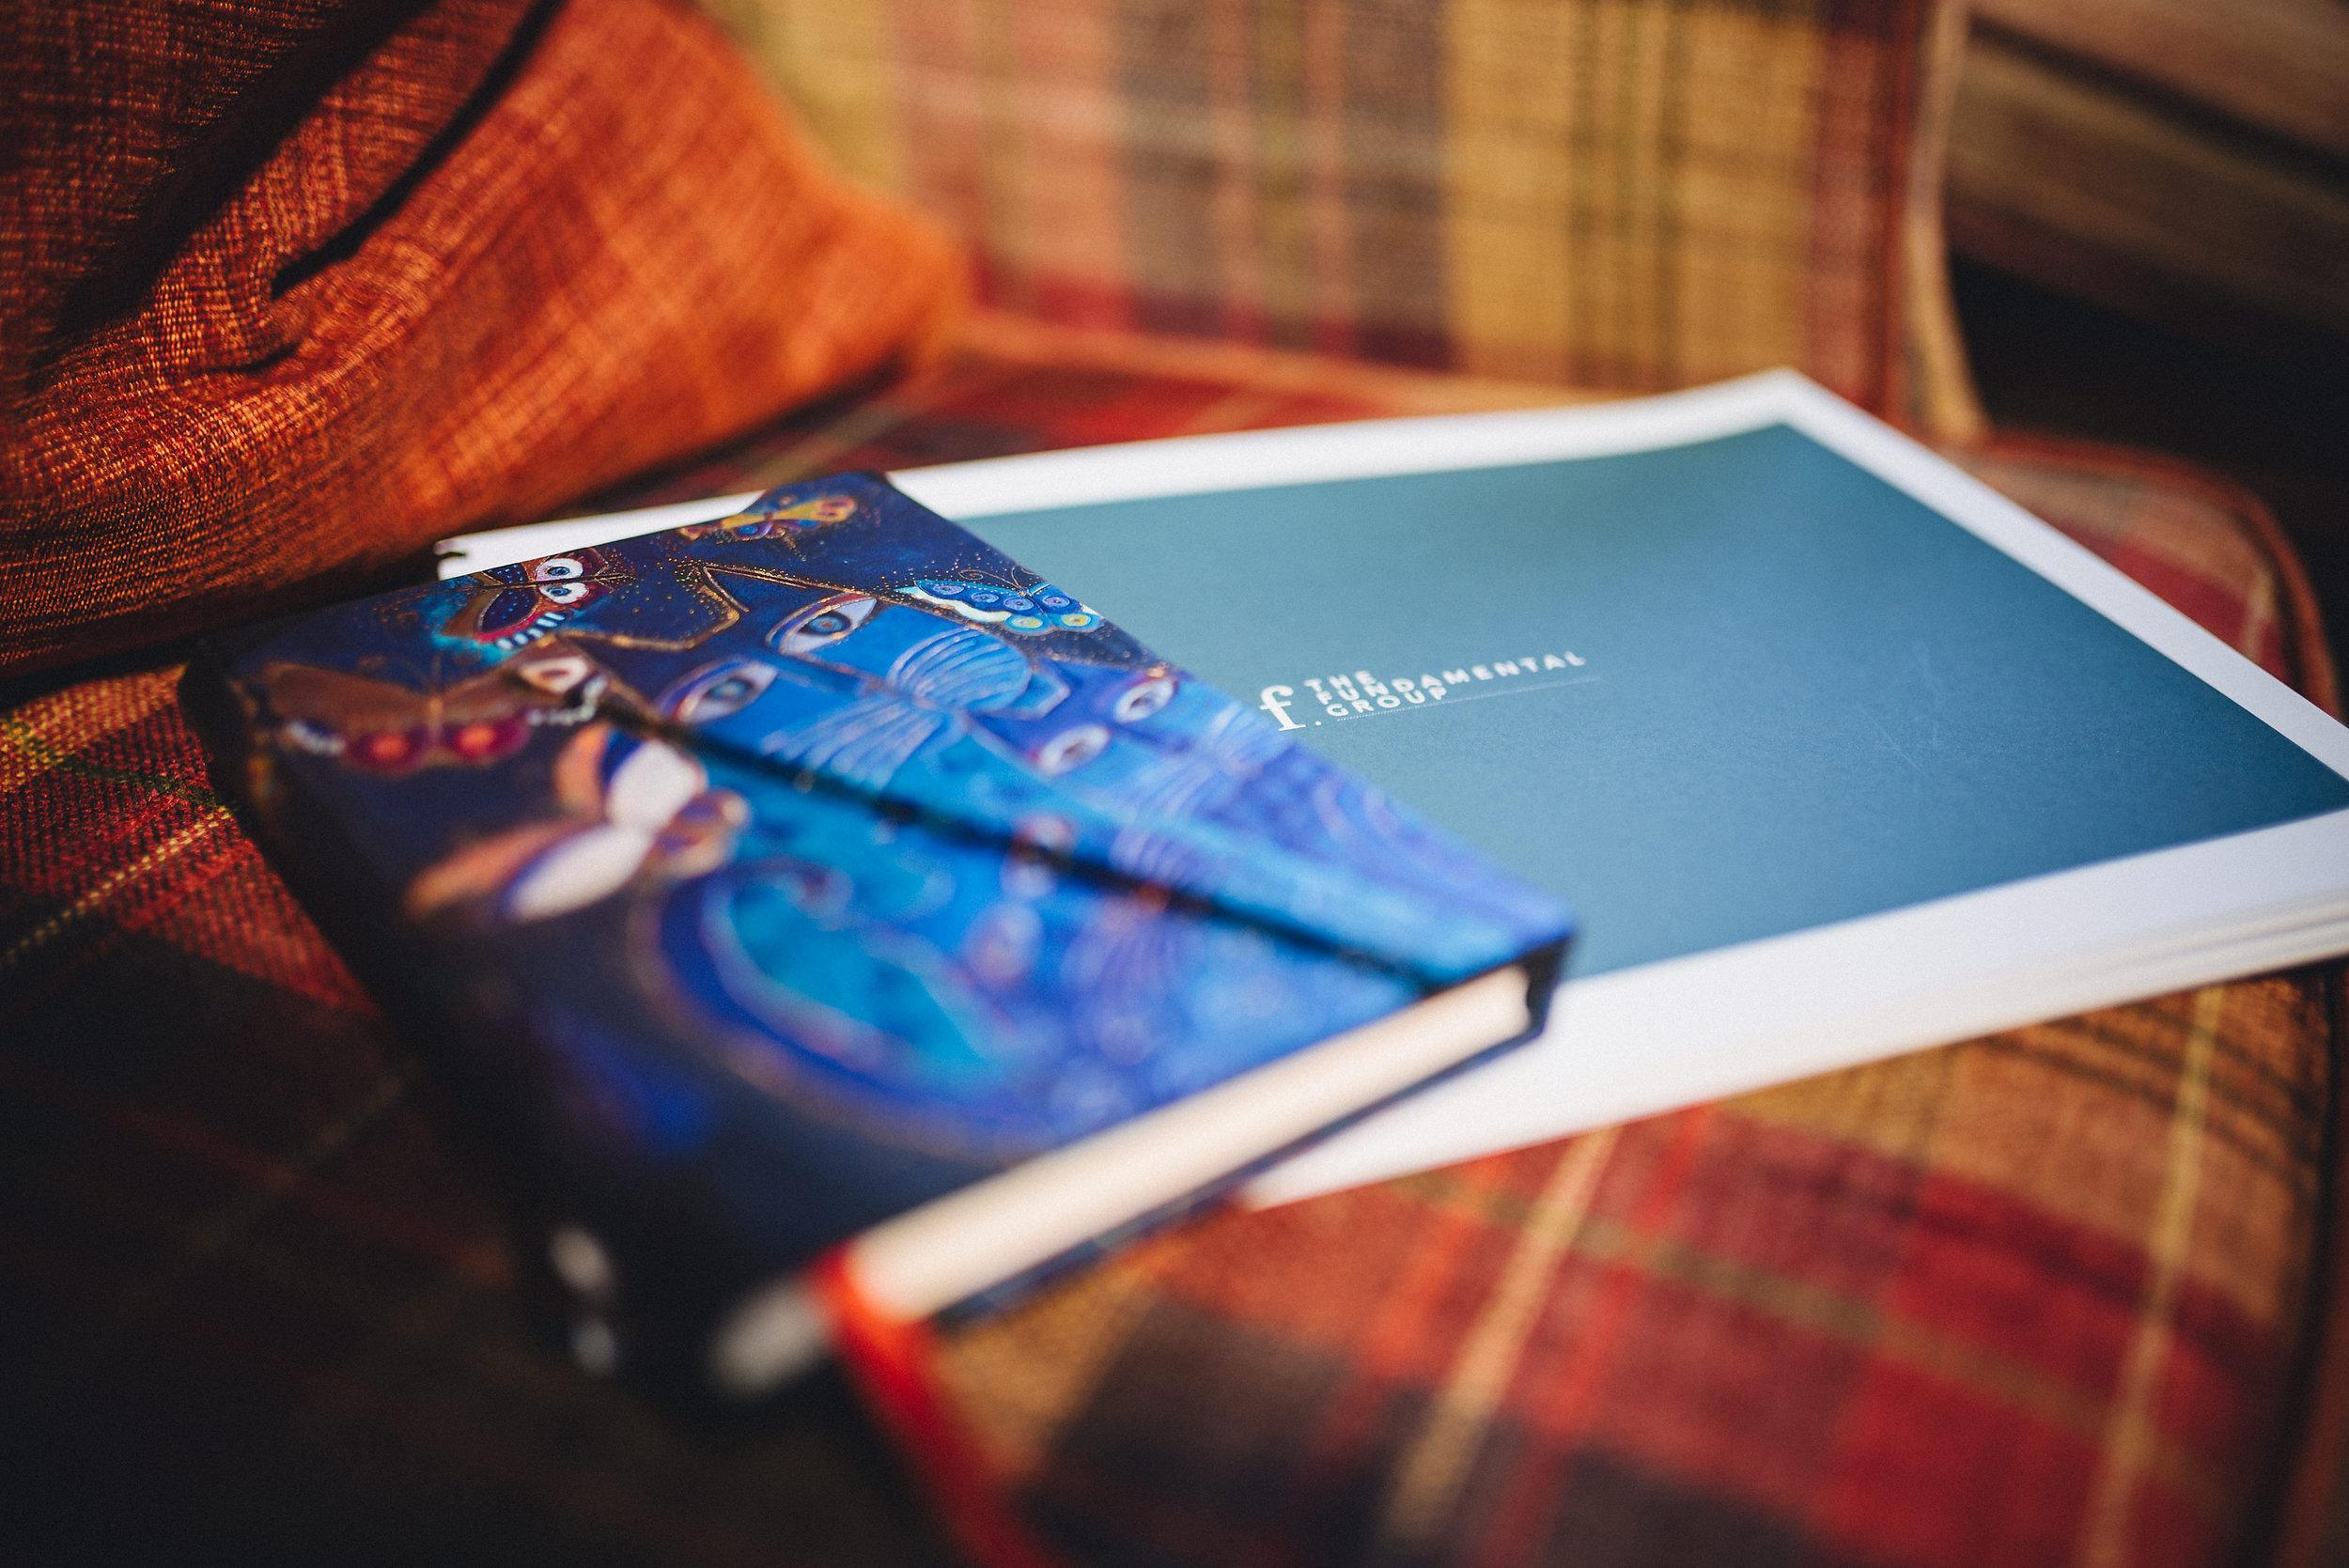 SouthLodgeHotel-BrandingShoot-MariaAssiaPhotography-14.JPG